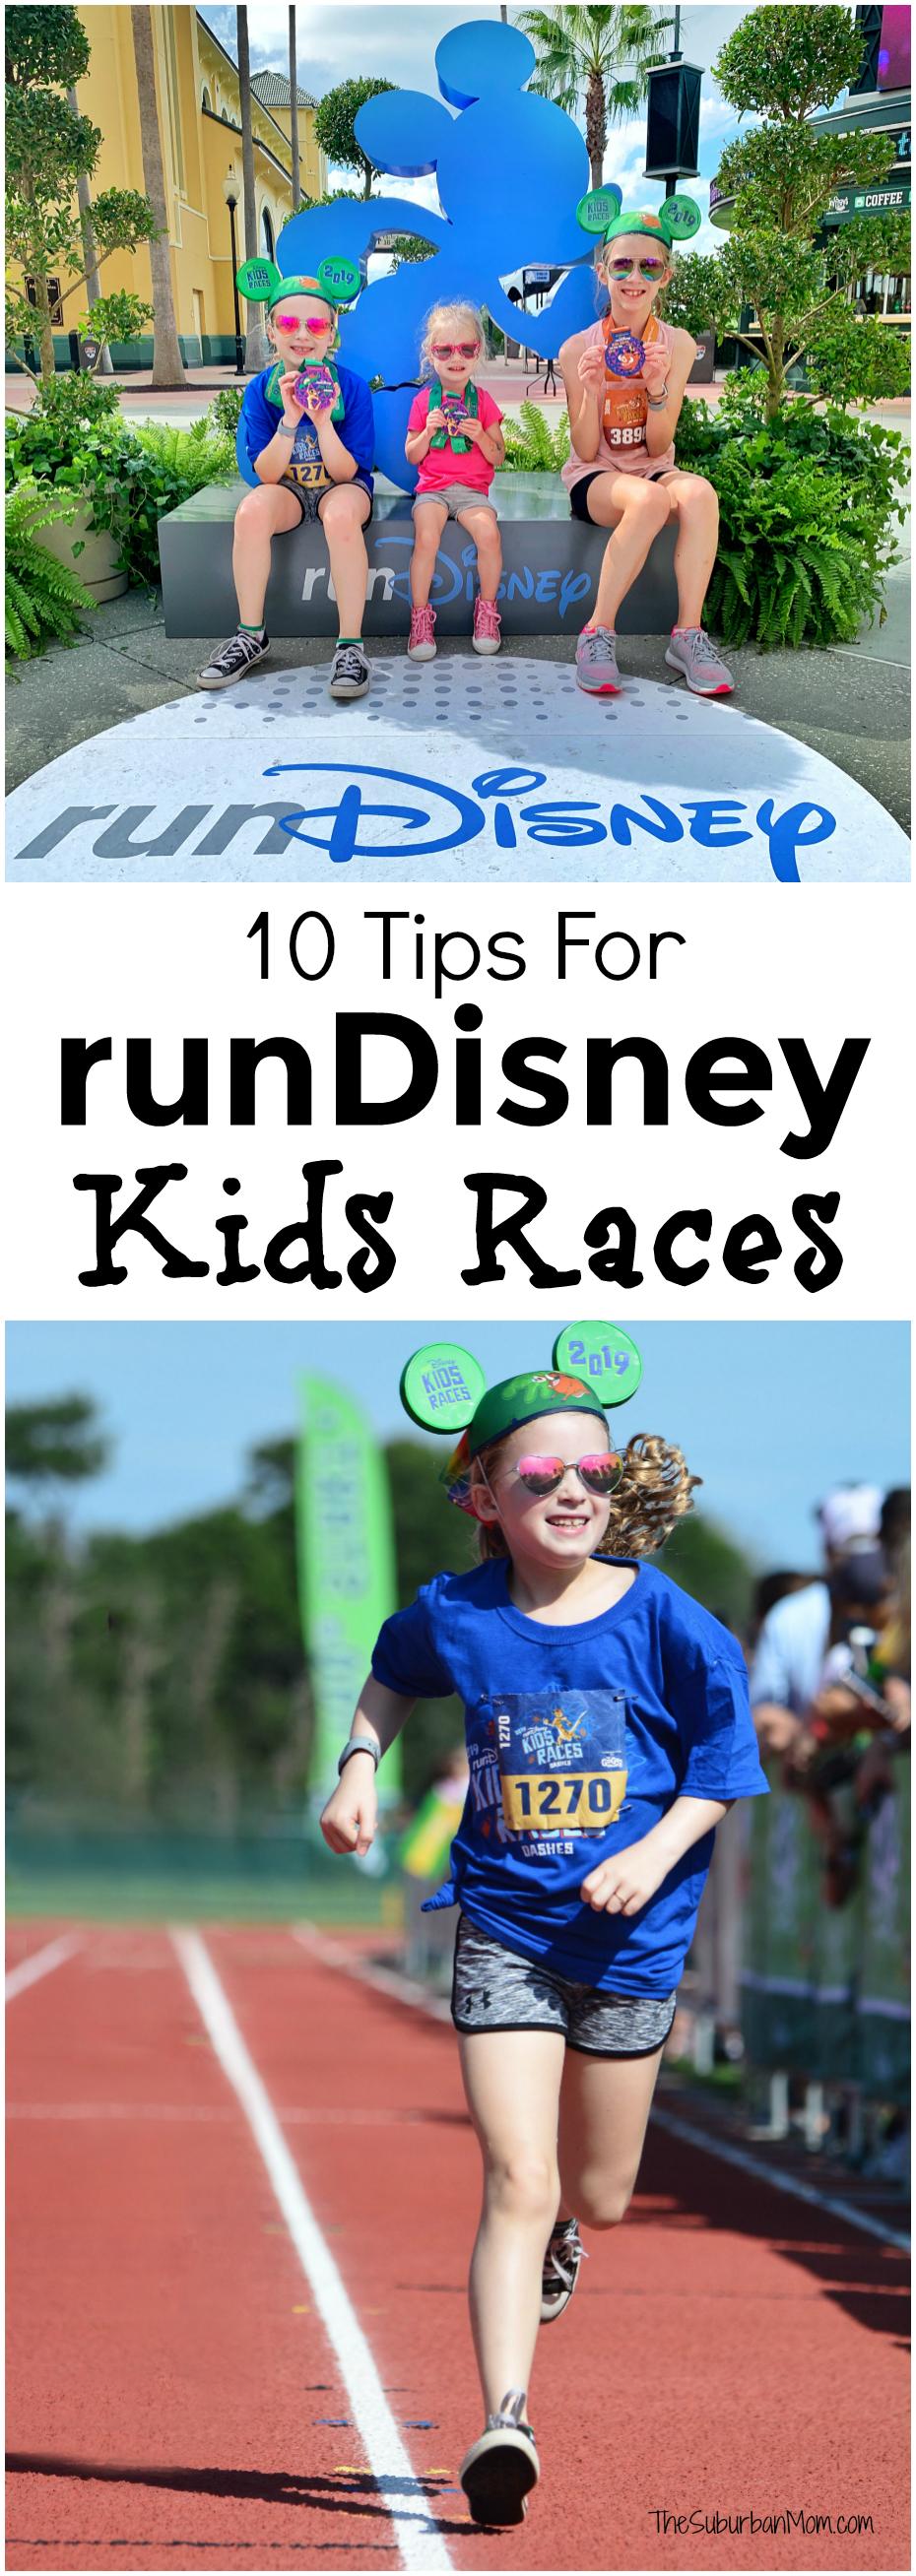 runDisney Kids Races Tips